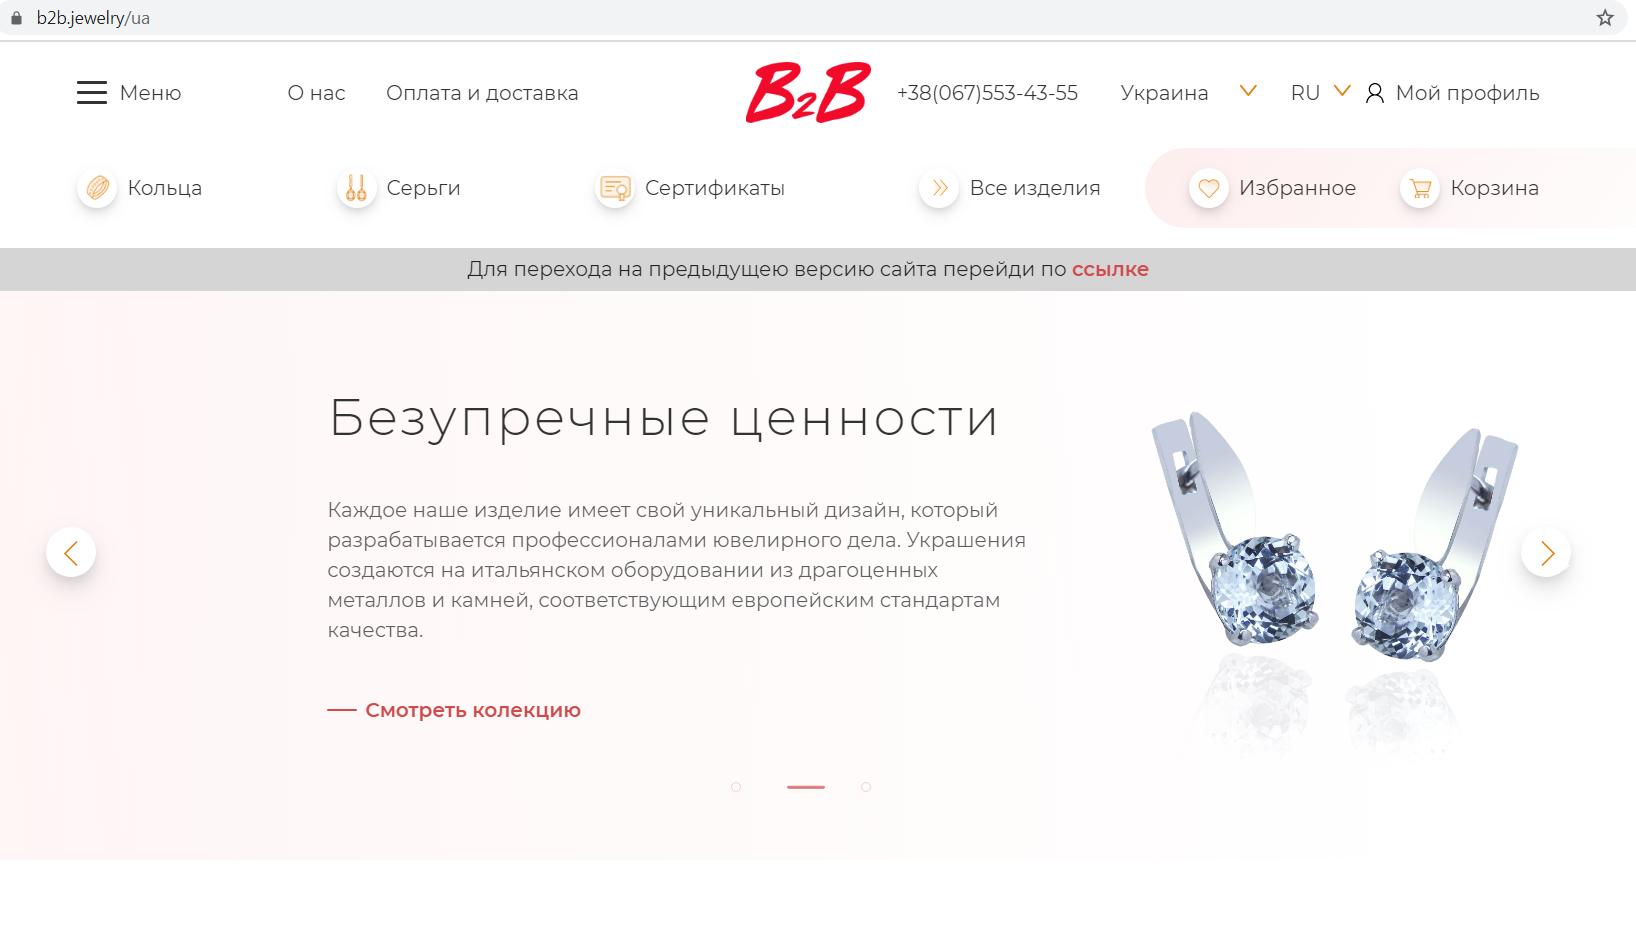 Новый сайт компании b2b.jewelry.ua